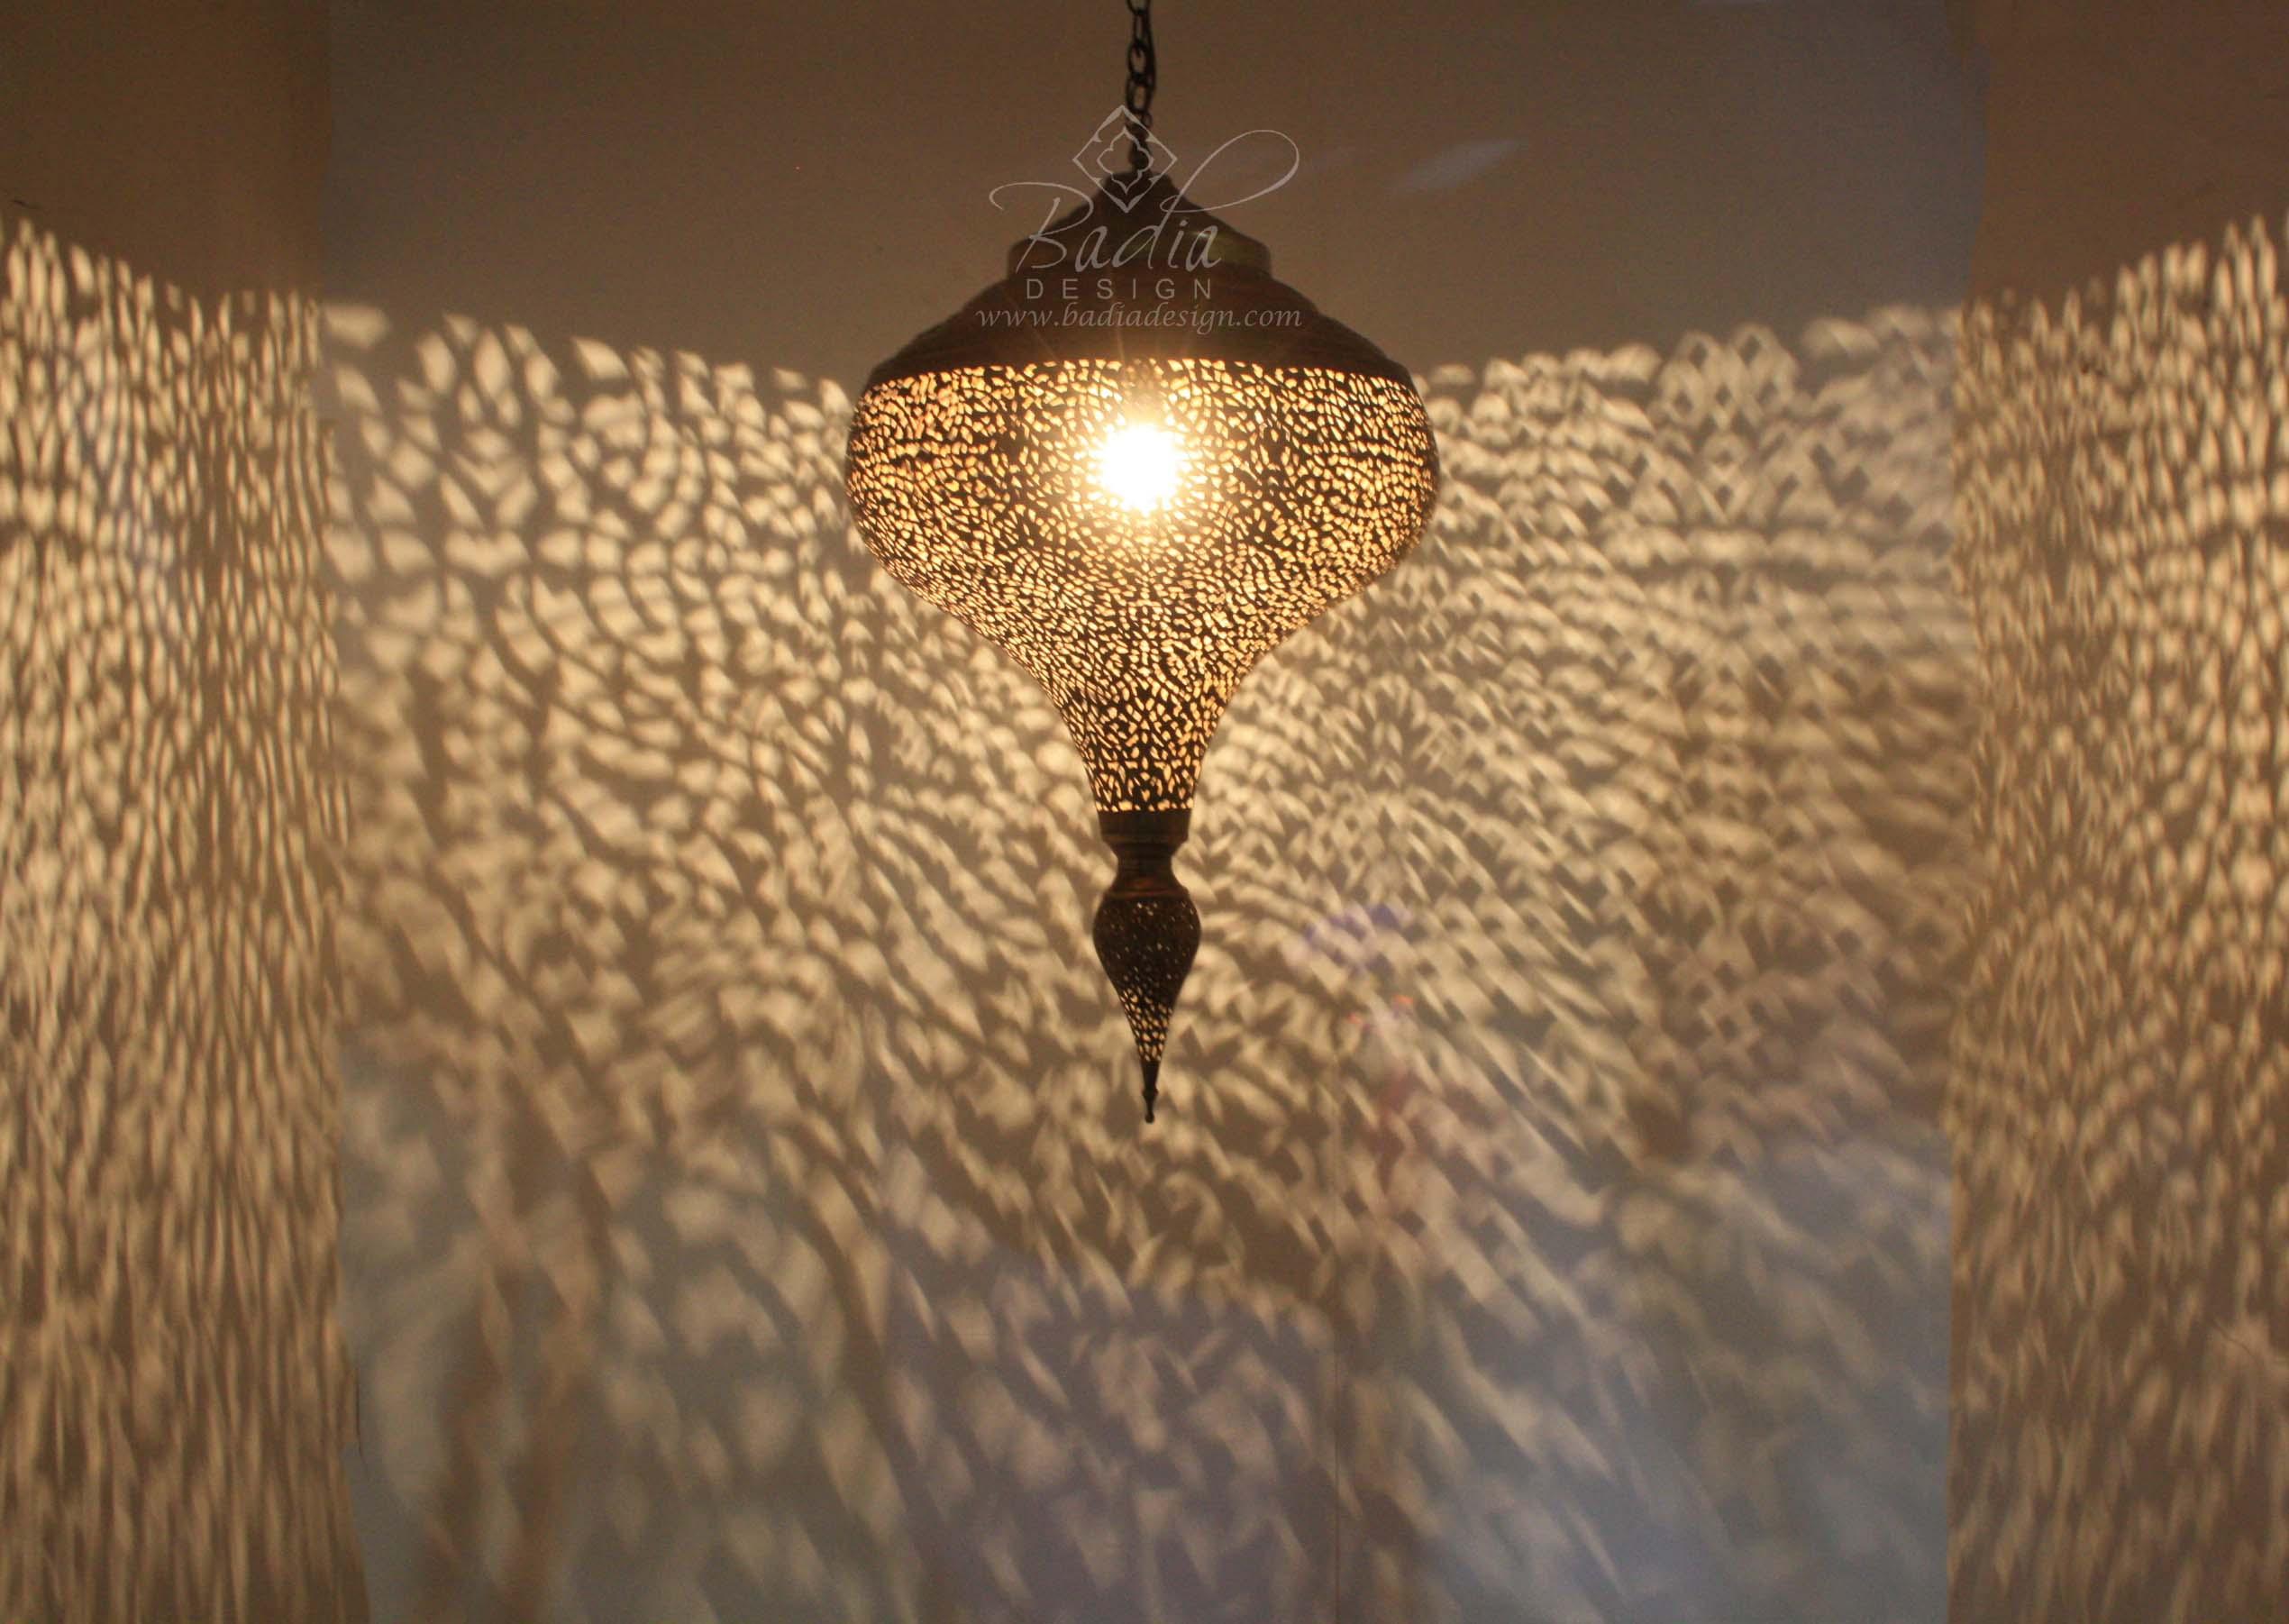 moroccan-party-lighting-rental-los-angeles-ch255-2.jpg